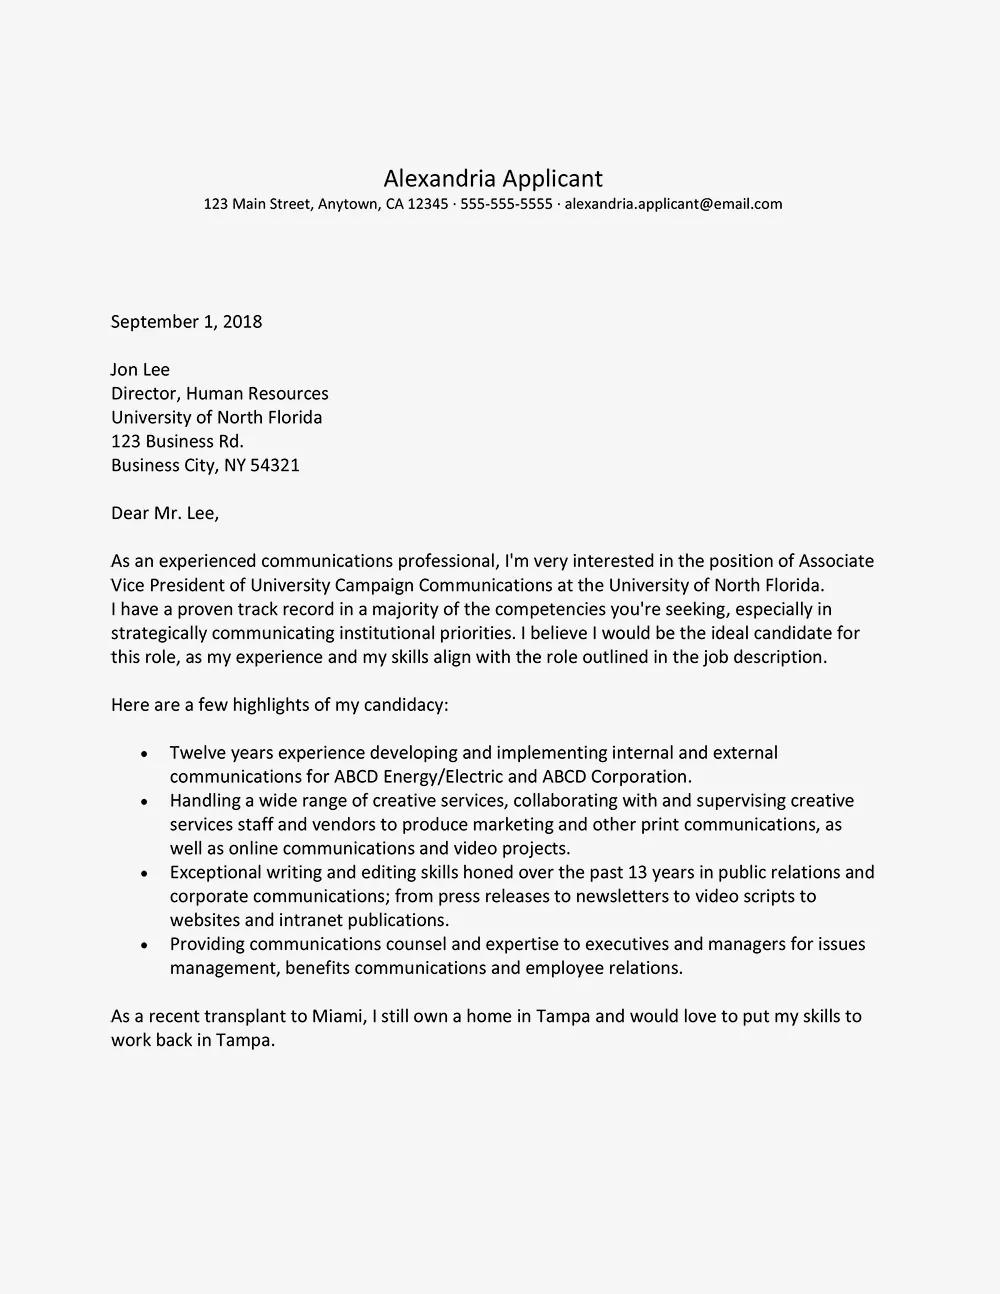 sample cover letters for higher education communications cv law internship pdf housekeeper job duties resume career change samples